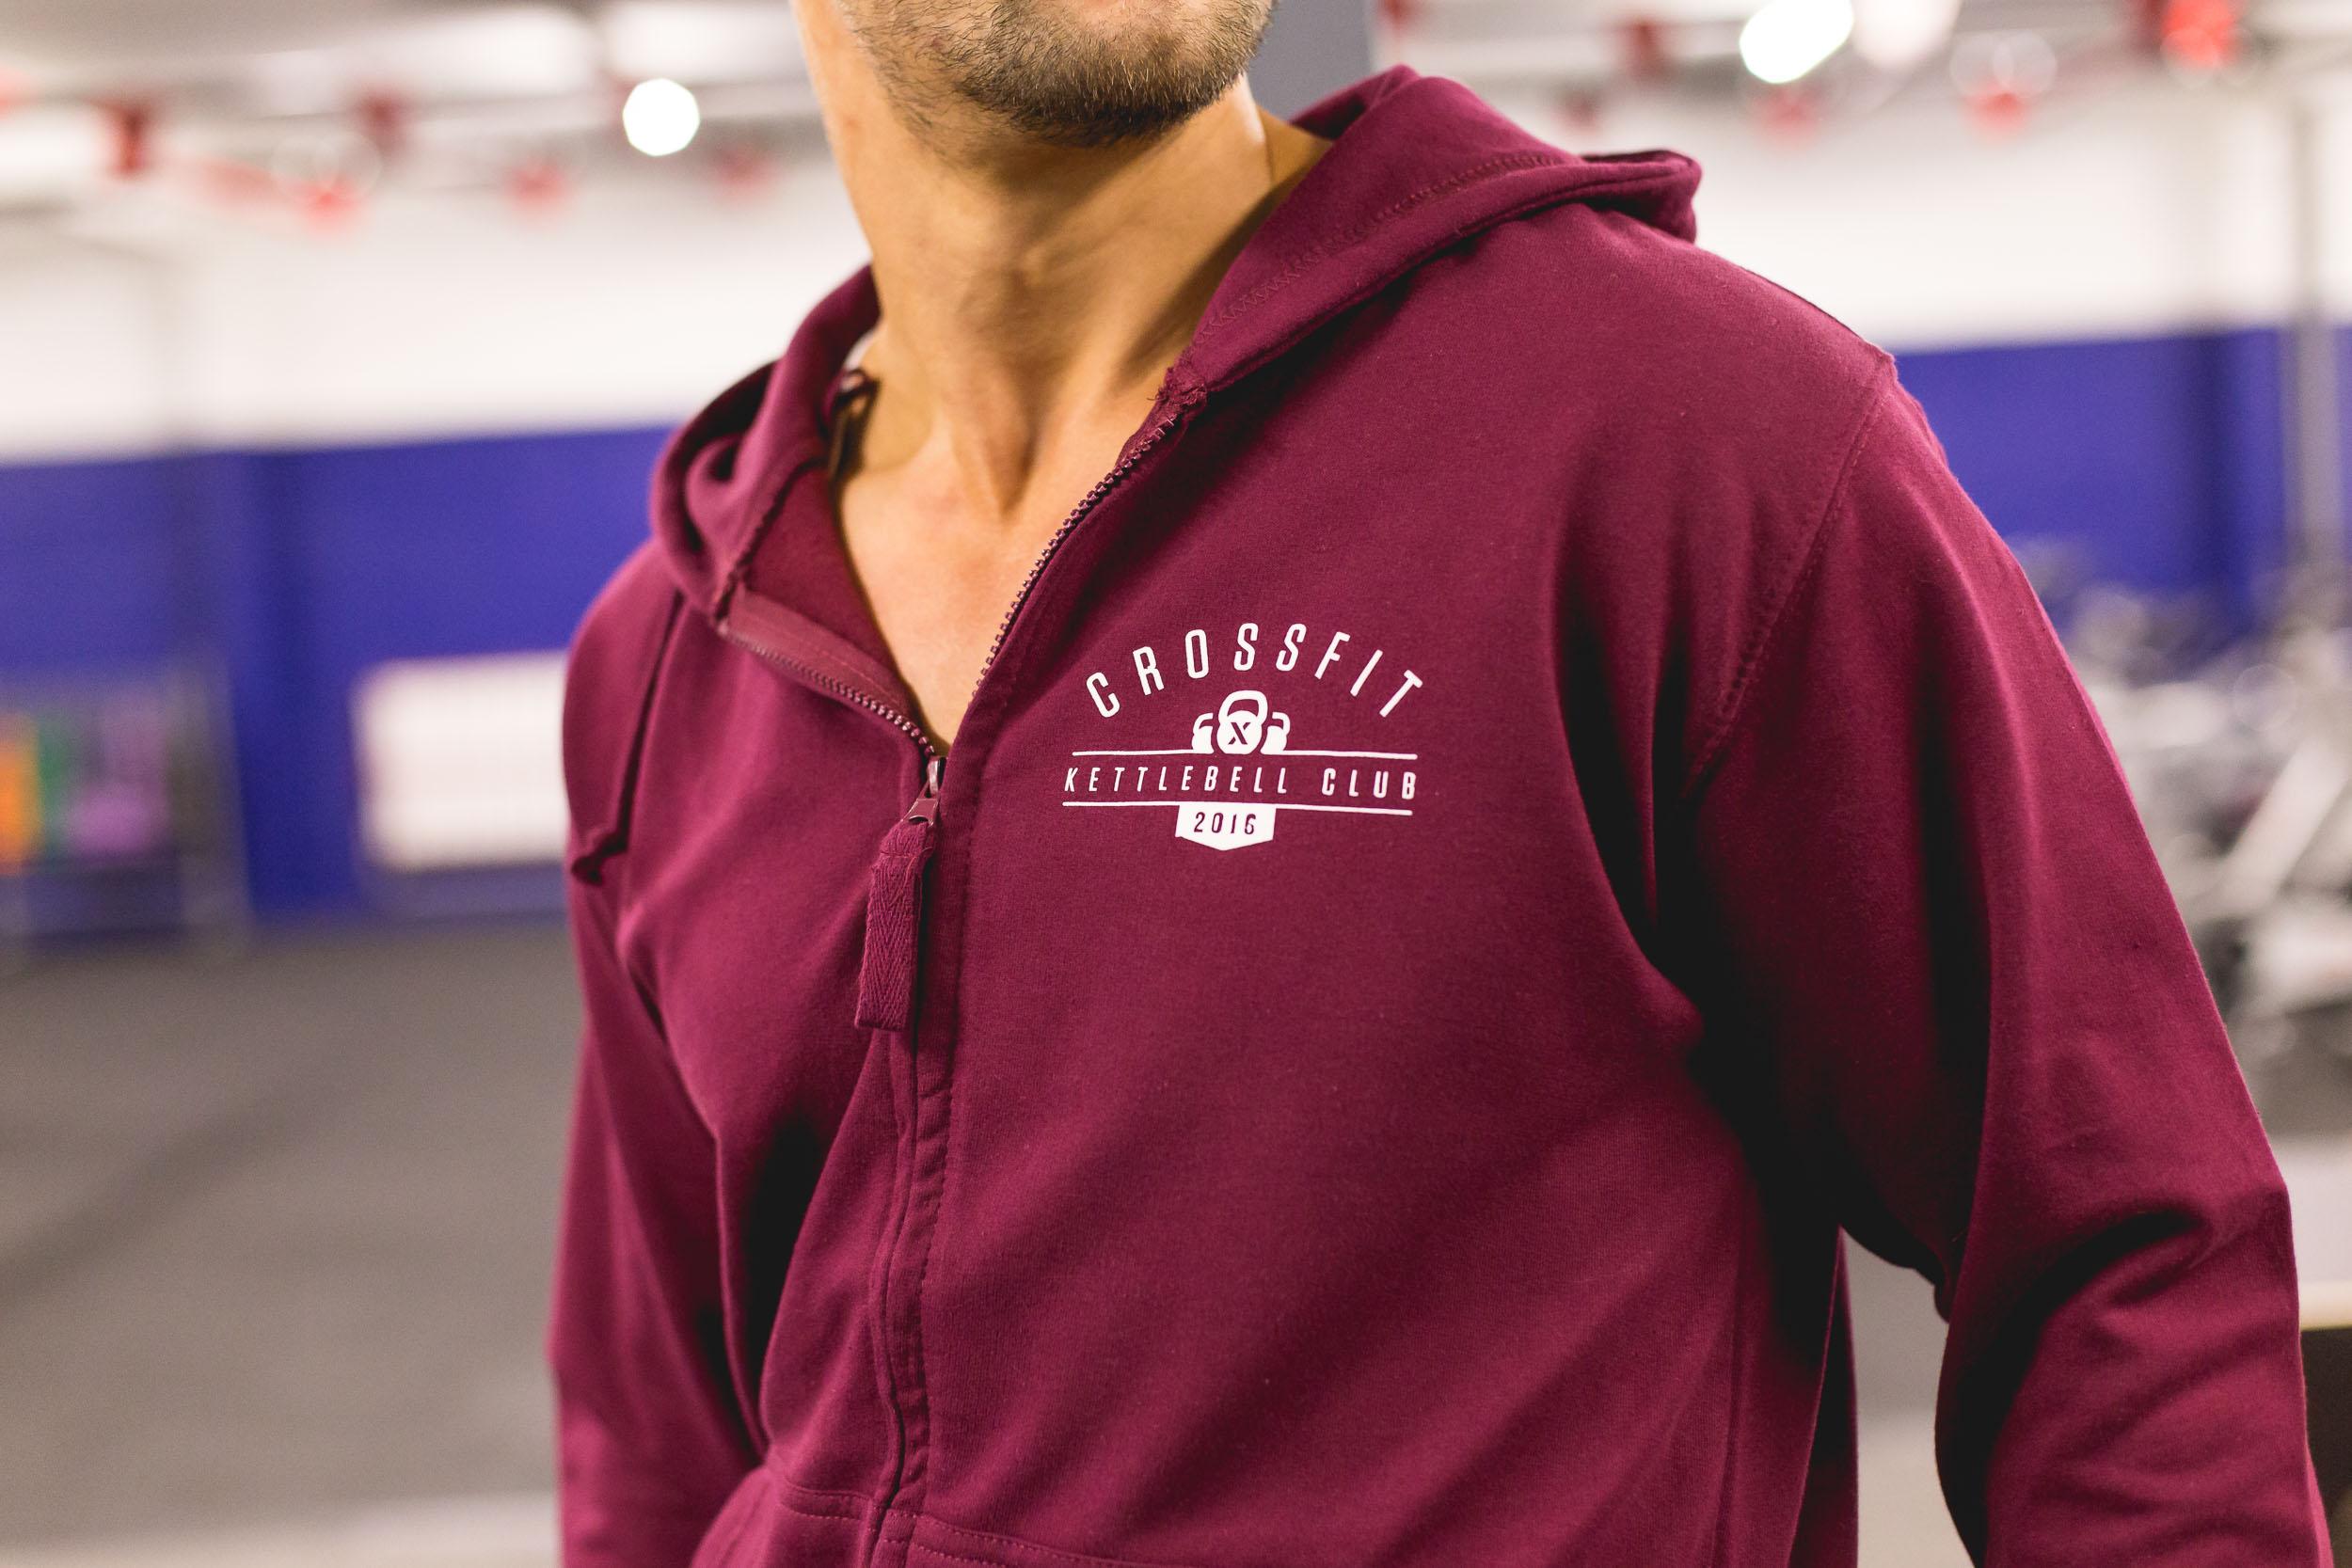 Crossfit UK printed clothing t-shirts-9713.jpg